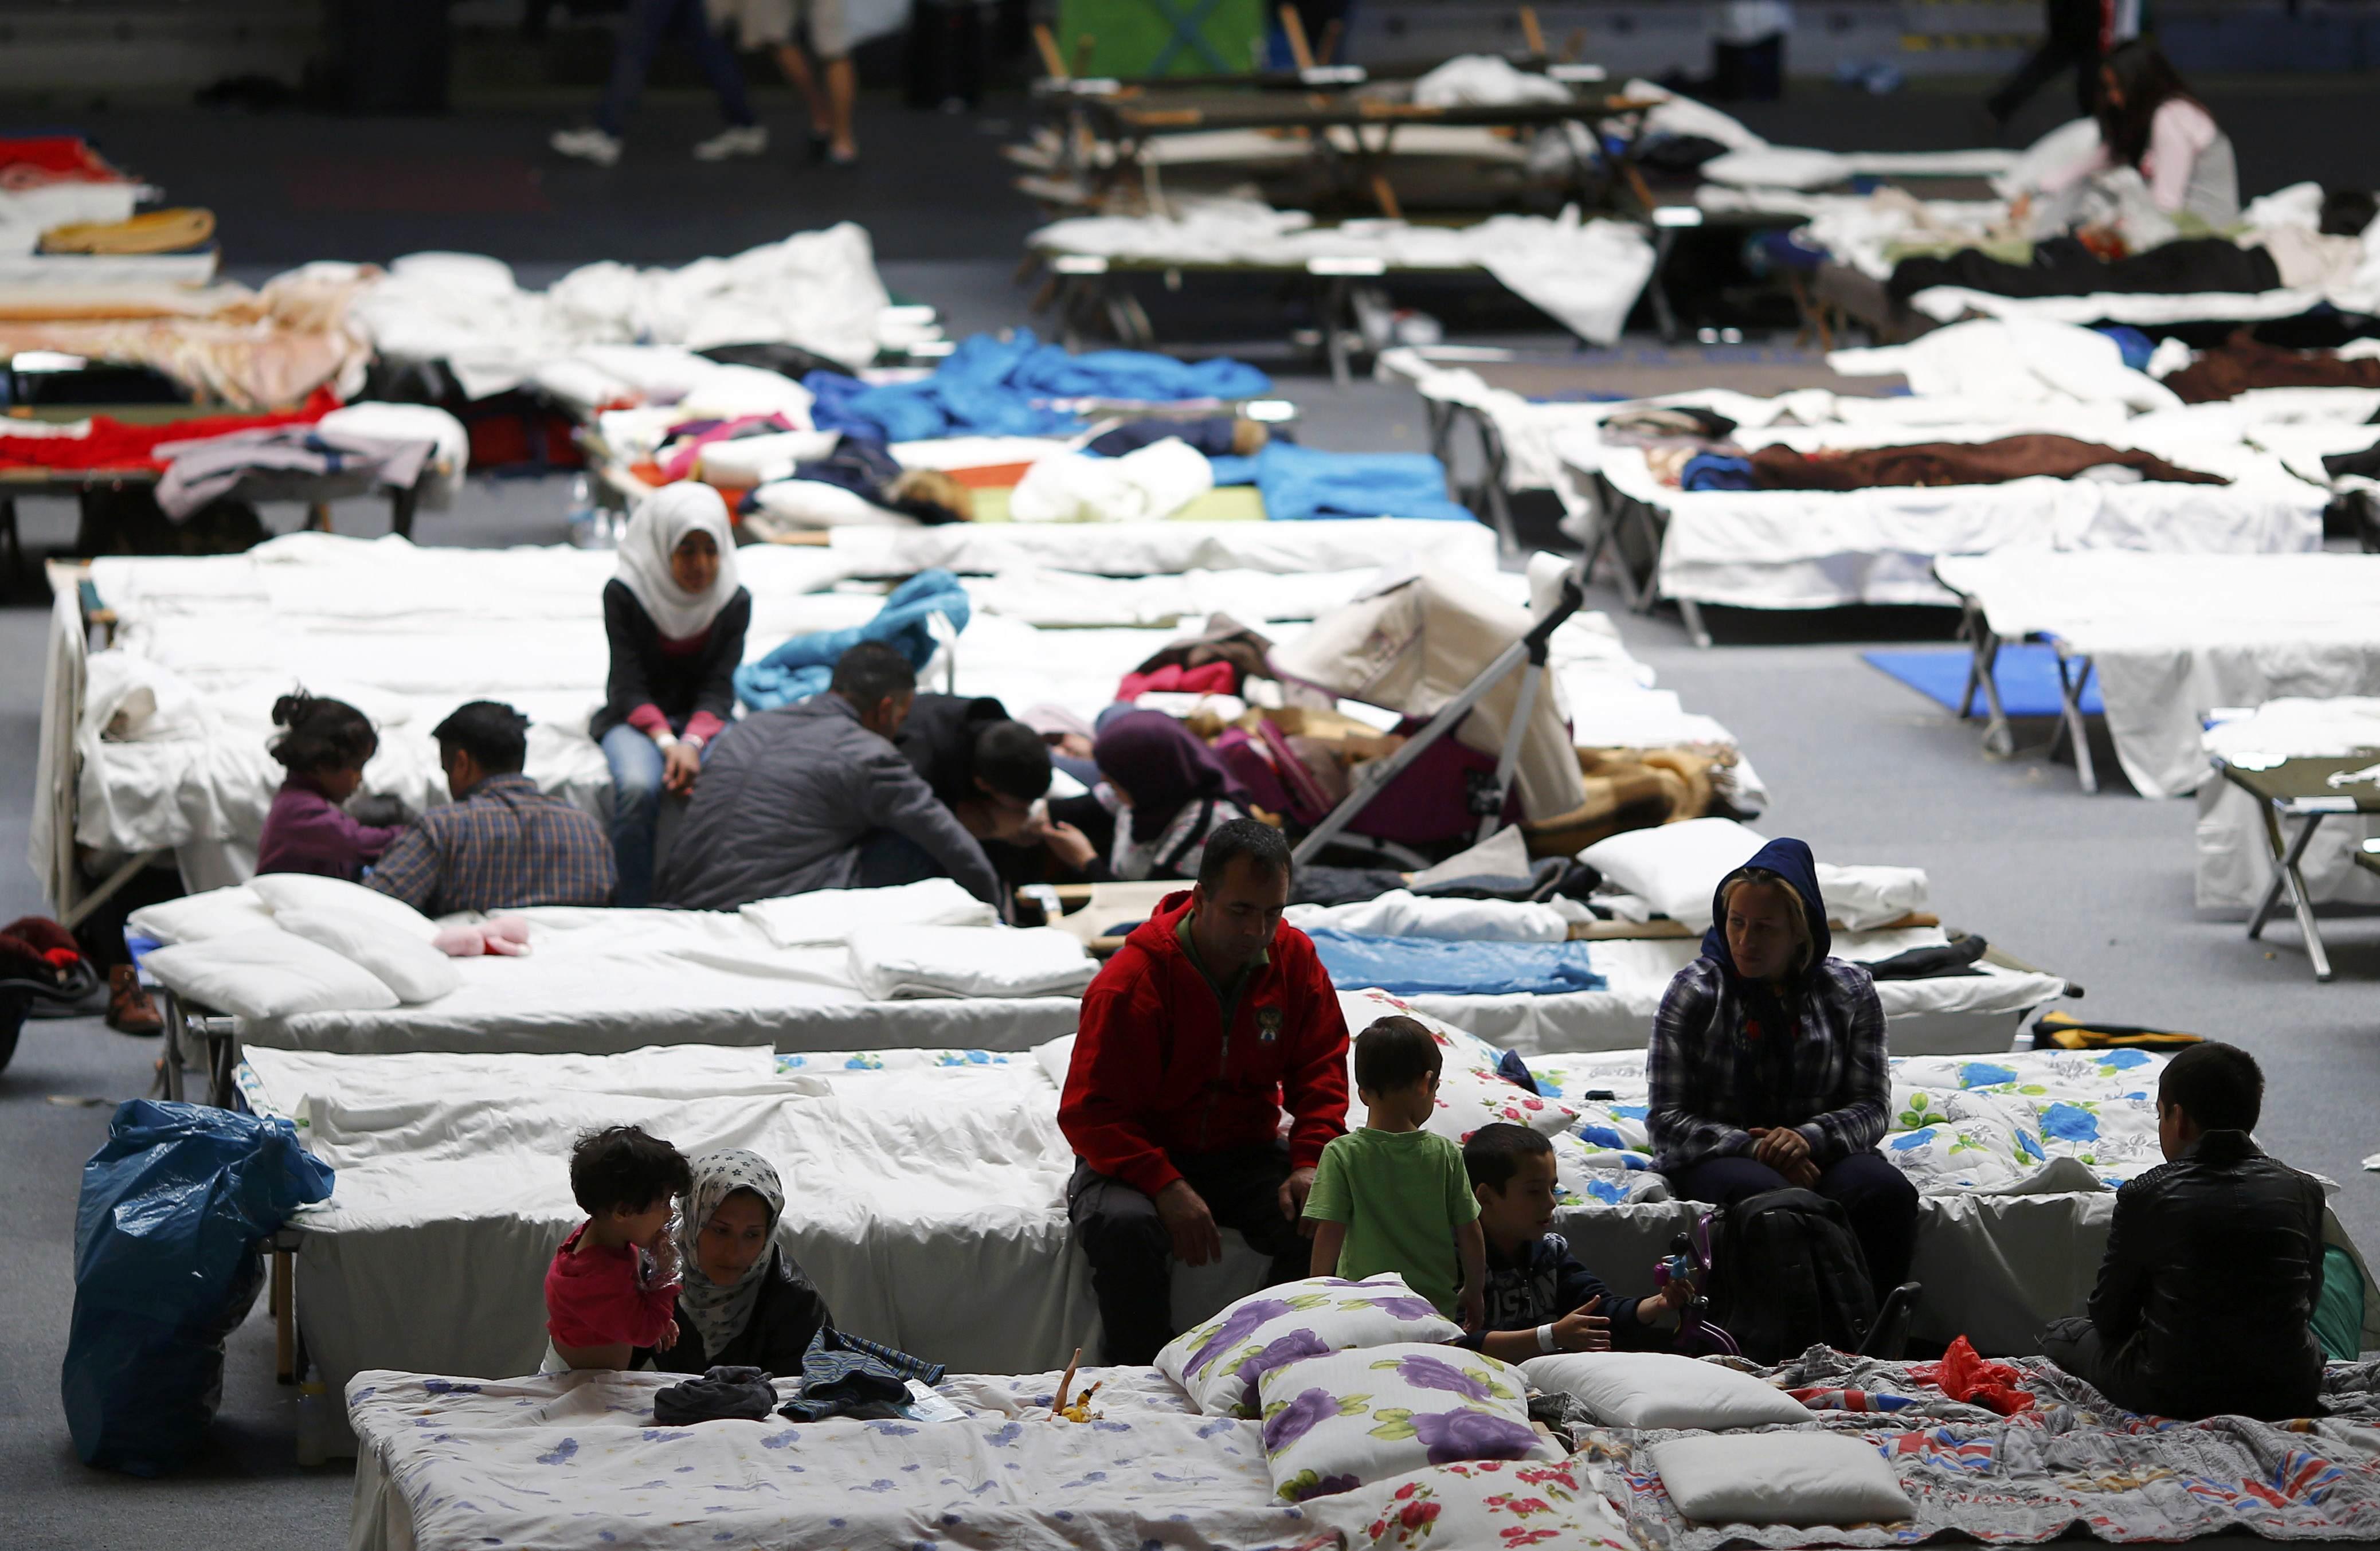 European ultimatum for the Refugee issue